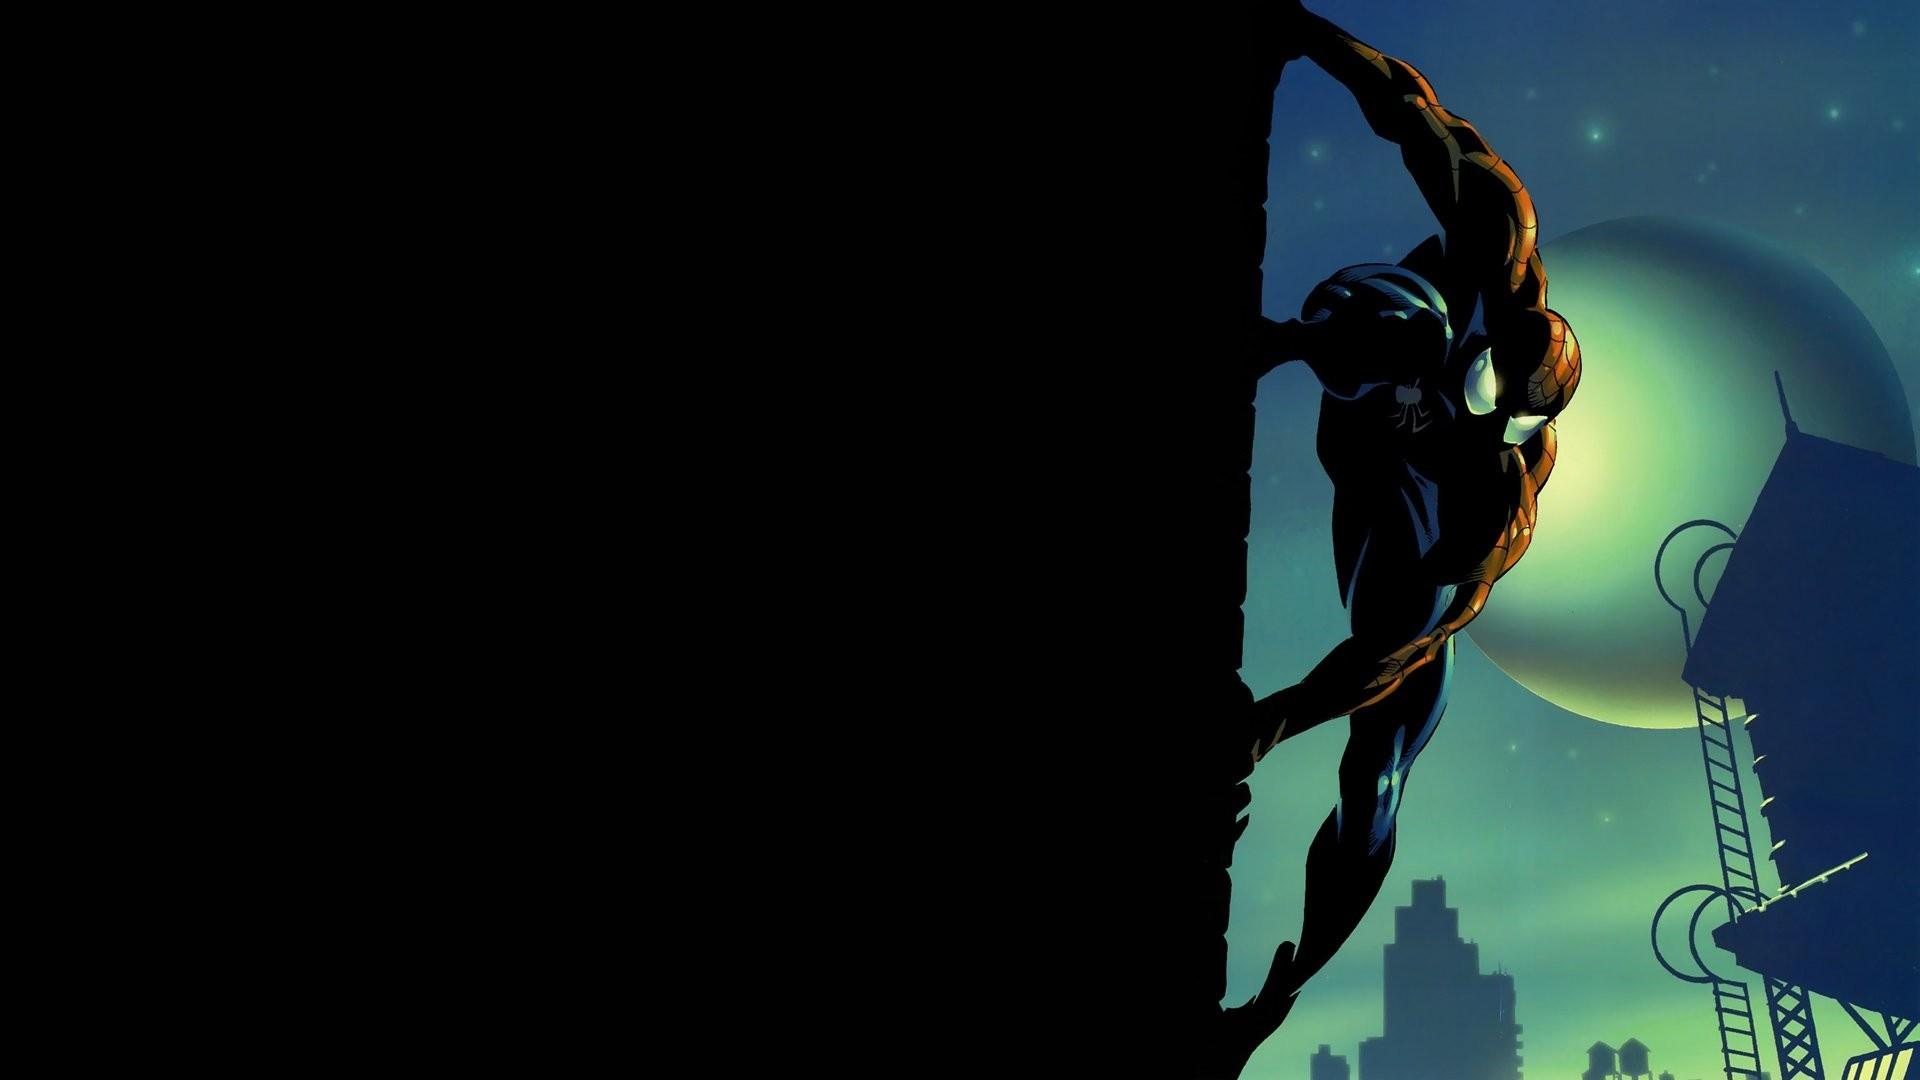 1920x1080 Wallpaper No Spider Man 2099 Walldevil